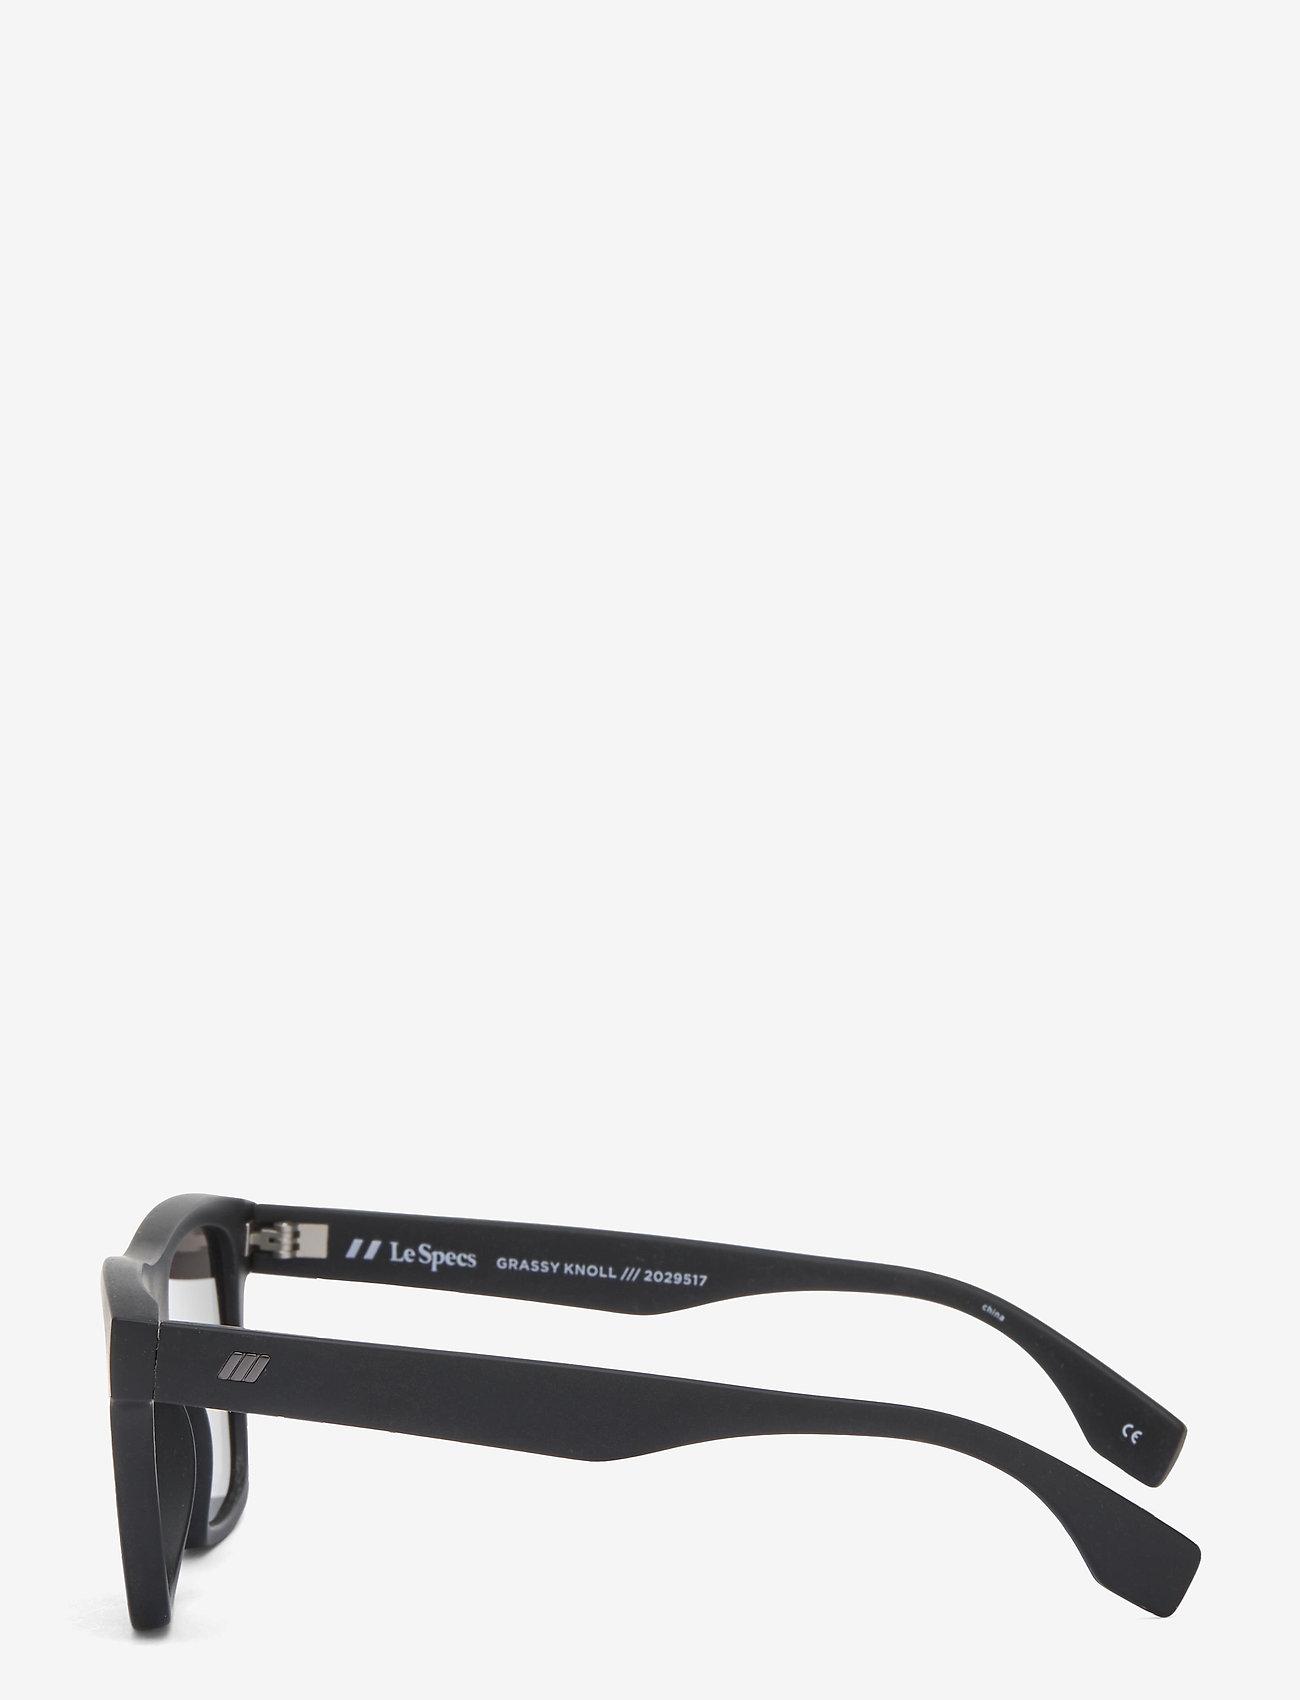 Le Specs - LE SUSTAIN - GRASSY KNOLL - d-vormige - black grass w/ red mirror - 2